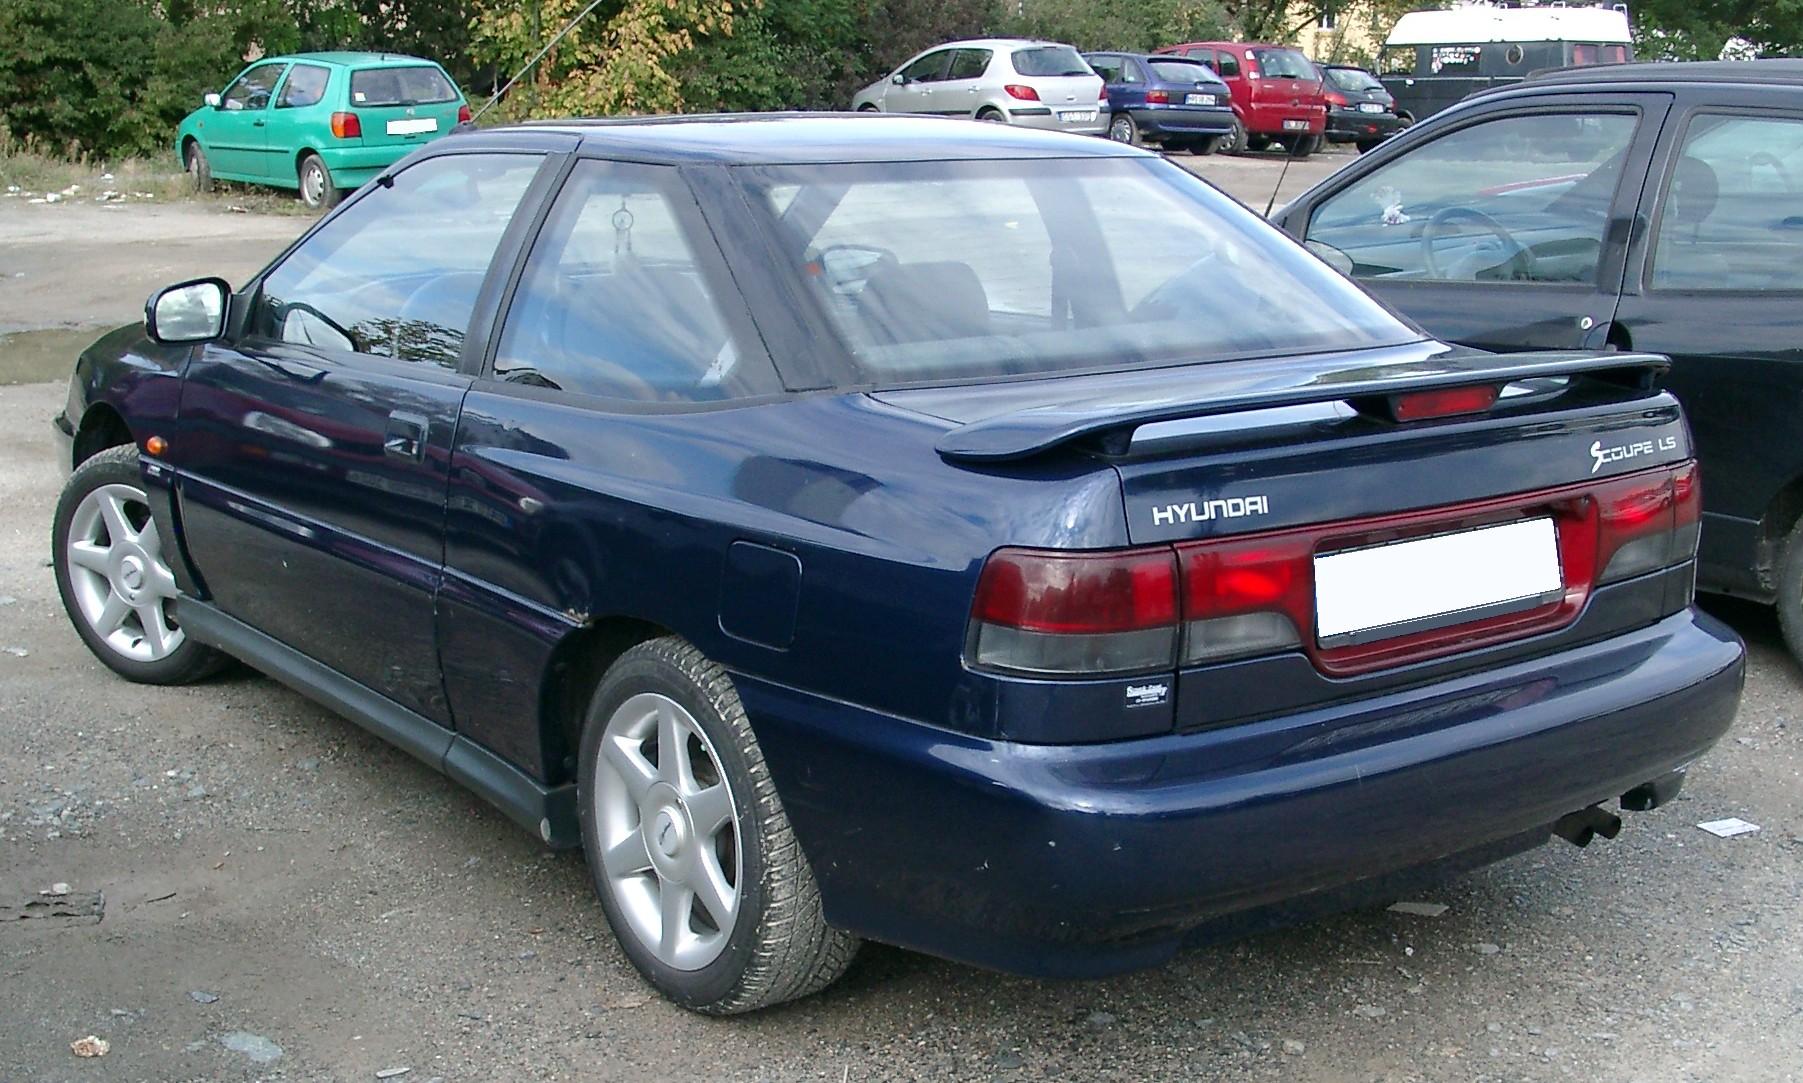 Hyundai Scoupe 1988 - 1996 Coupe #5